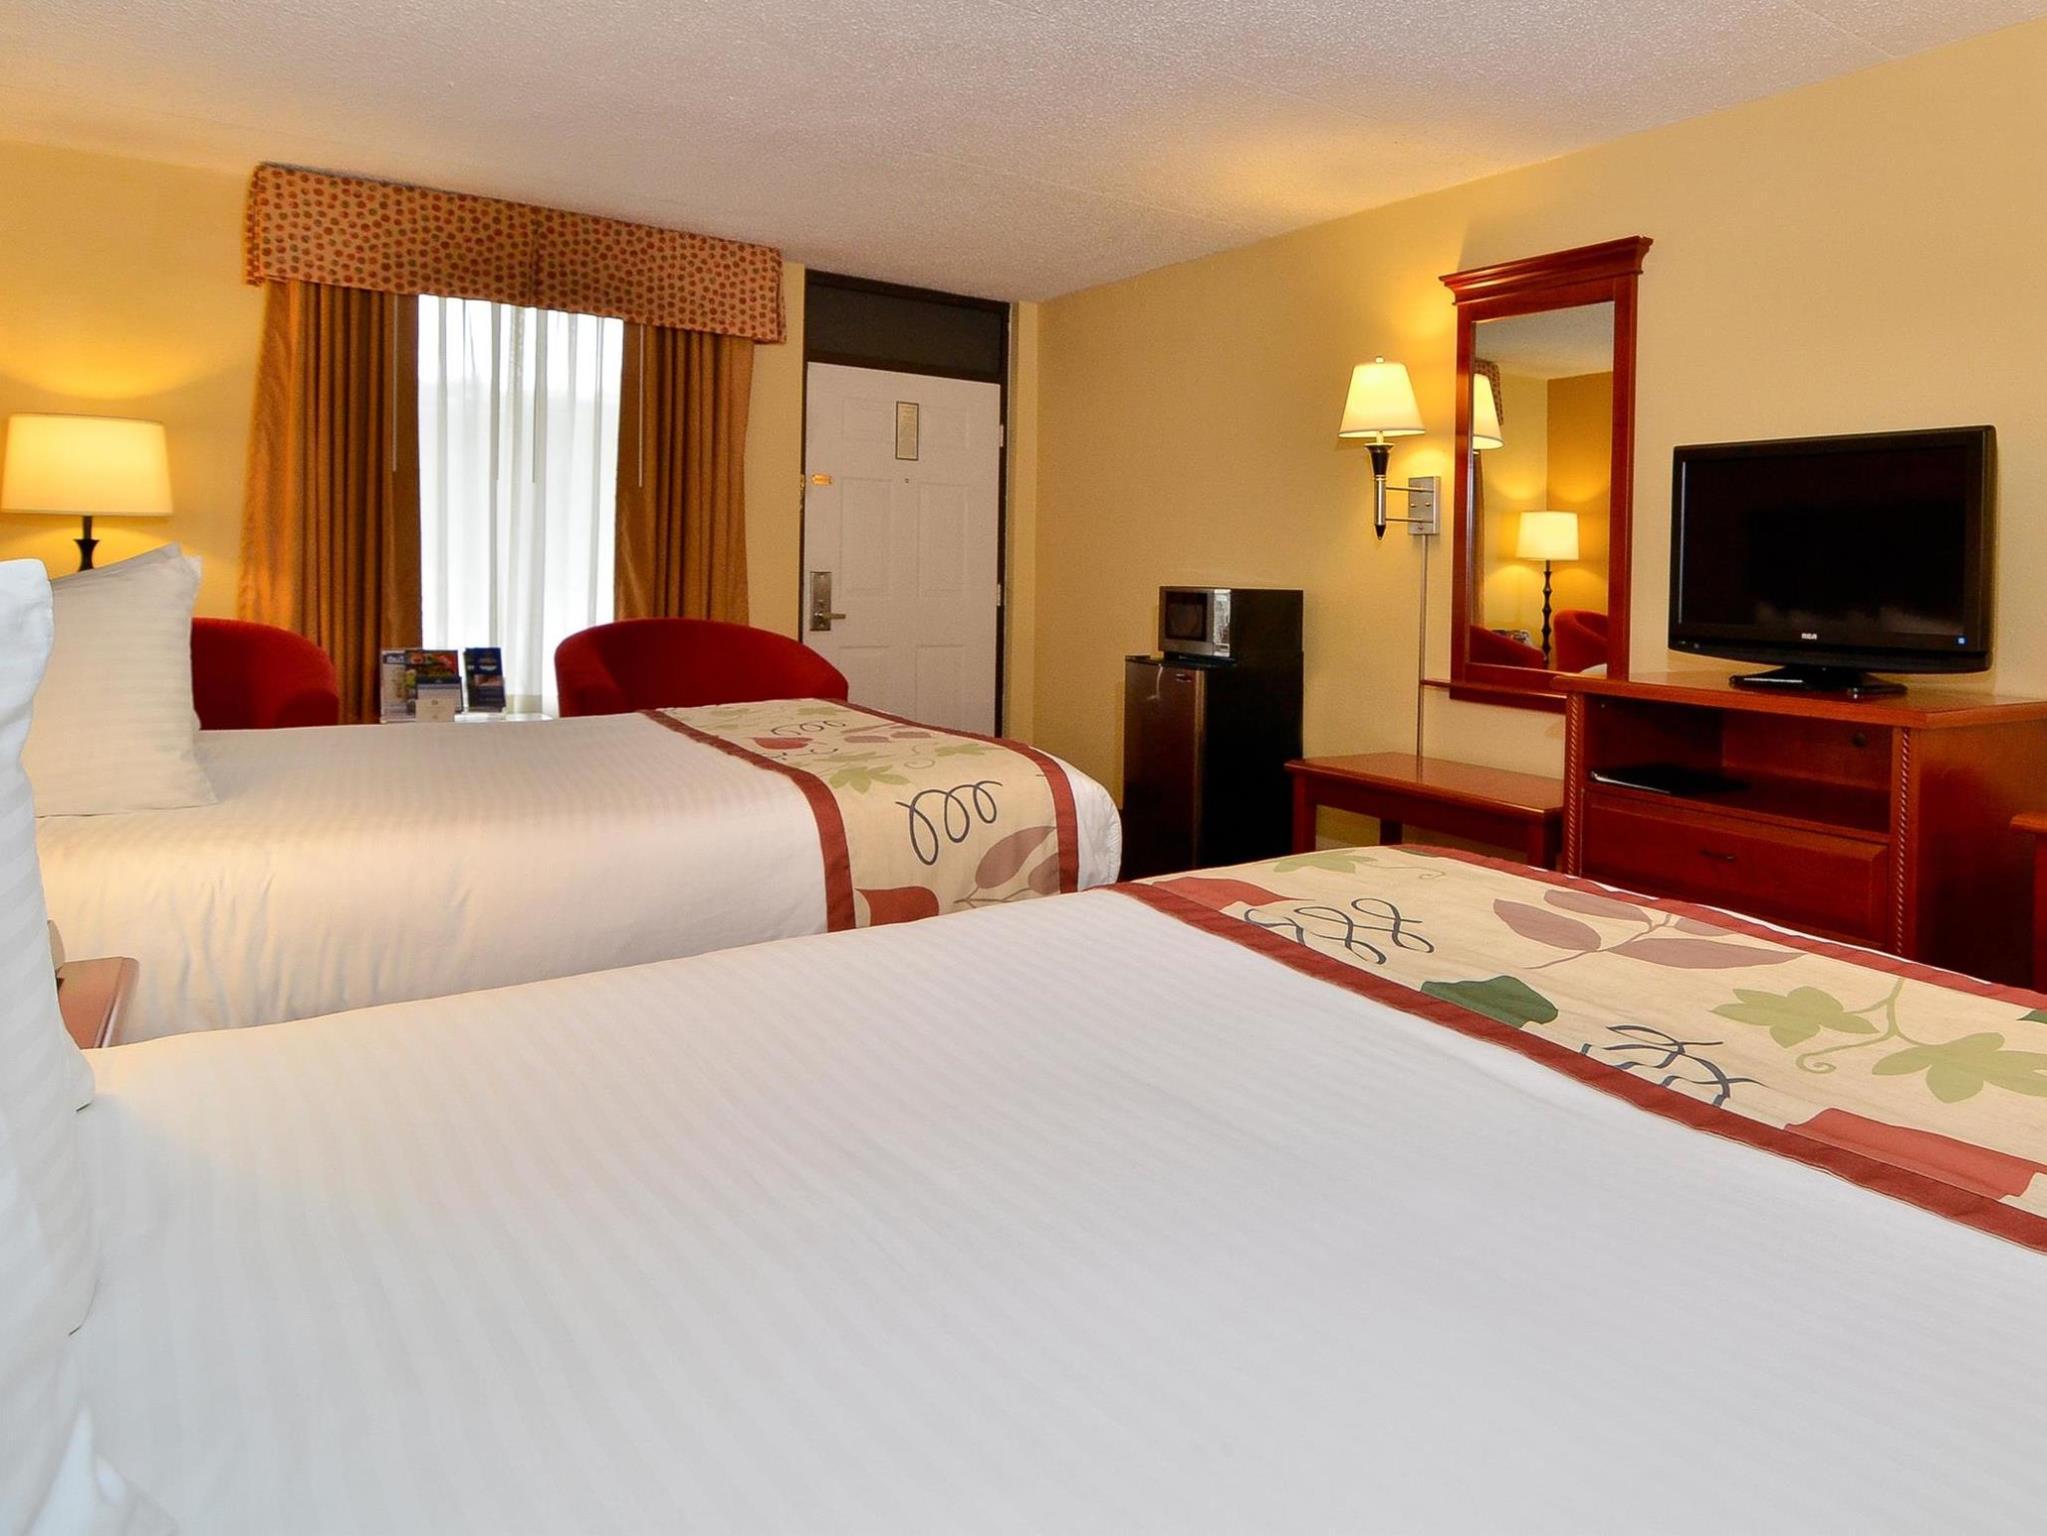 2 Double Beds Smoking Upstairs Best Western Corbin Inn